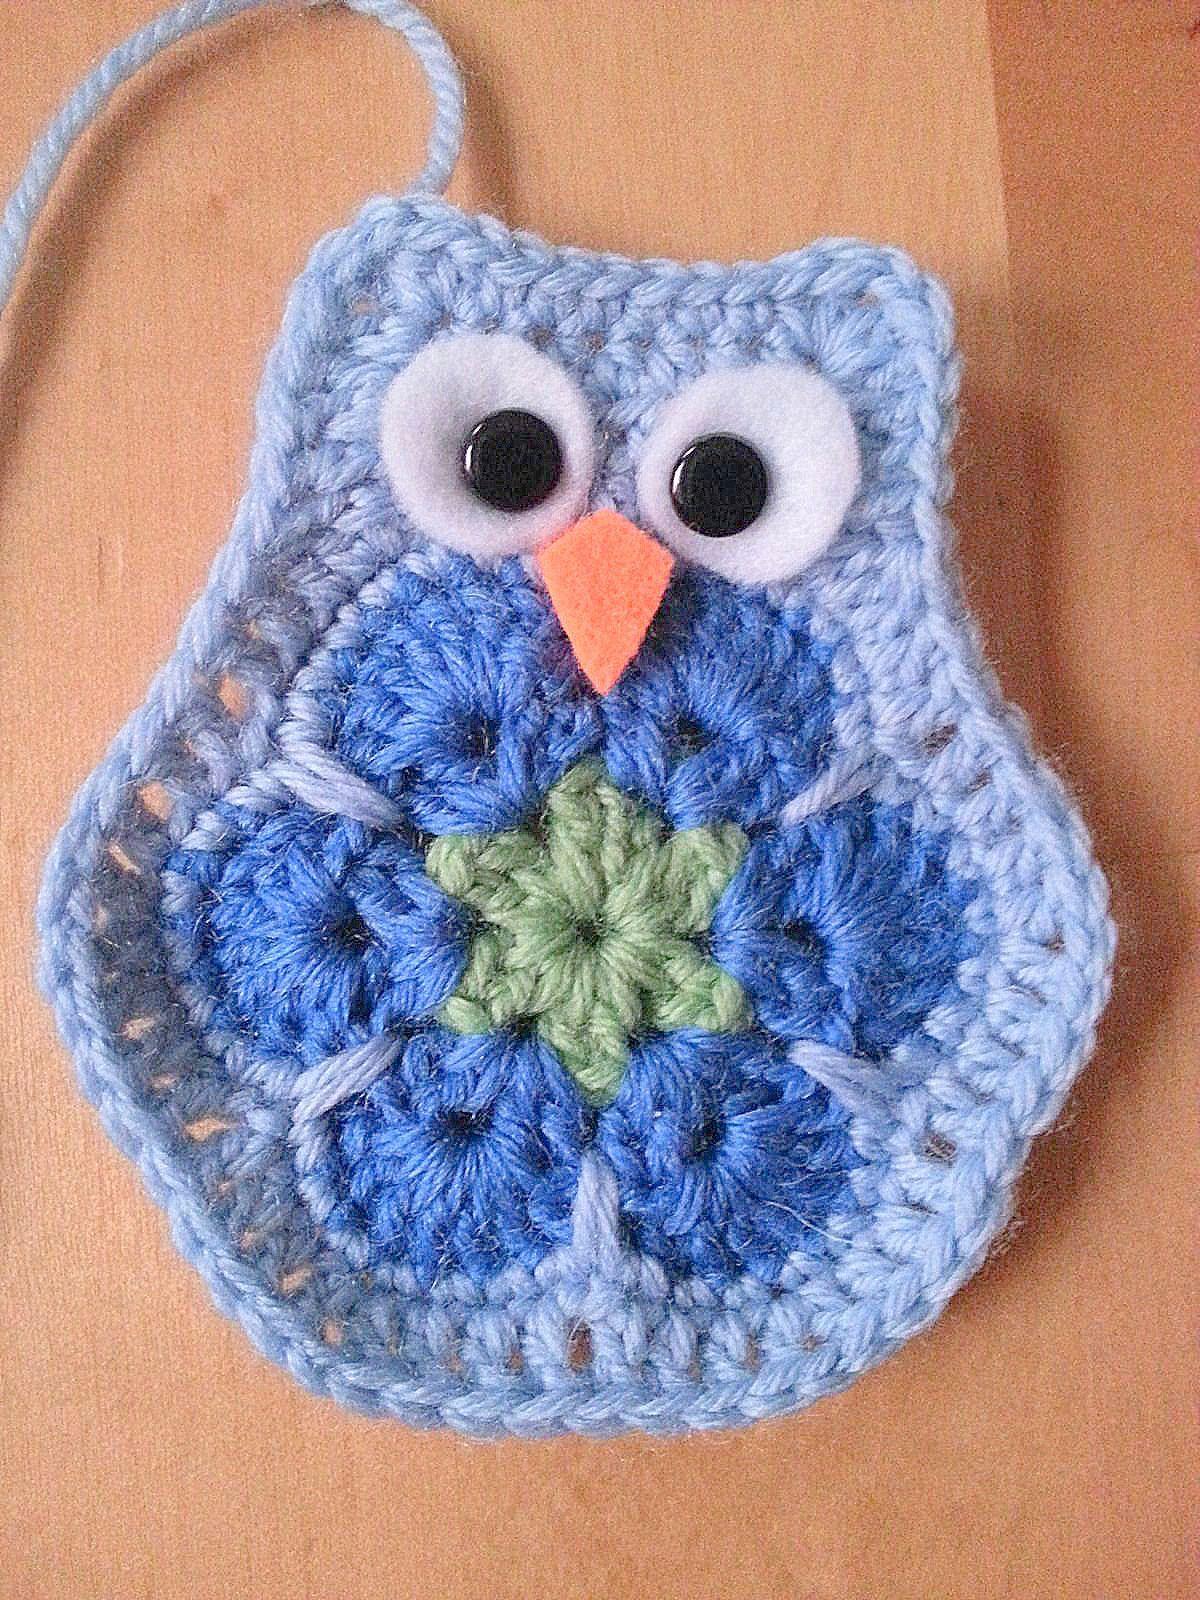 Crochet African Flower Owl -Pphoto Tutorial ❥ 4U // hf   Crafty ...